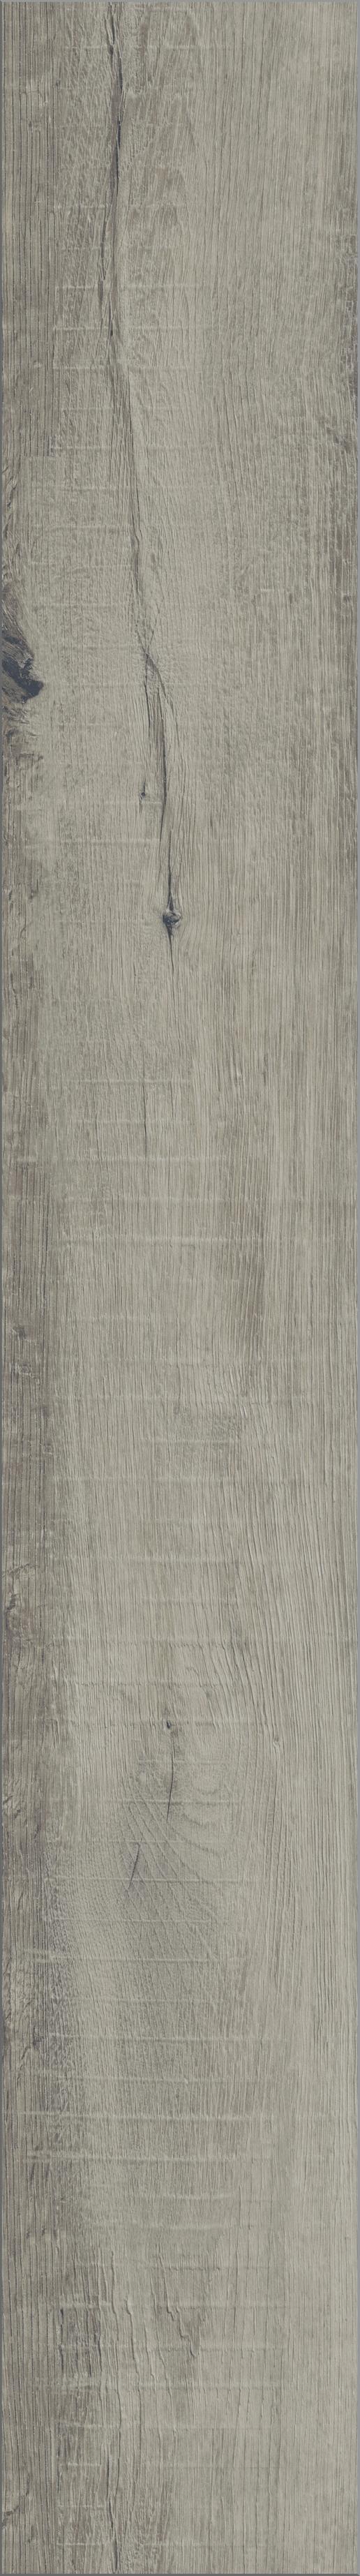 kronotex exquisit laminat gala eiche grau d 4786 von kronotex. Black Bedroom Furniture Sets. Home Design Ideas